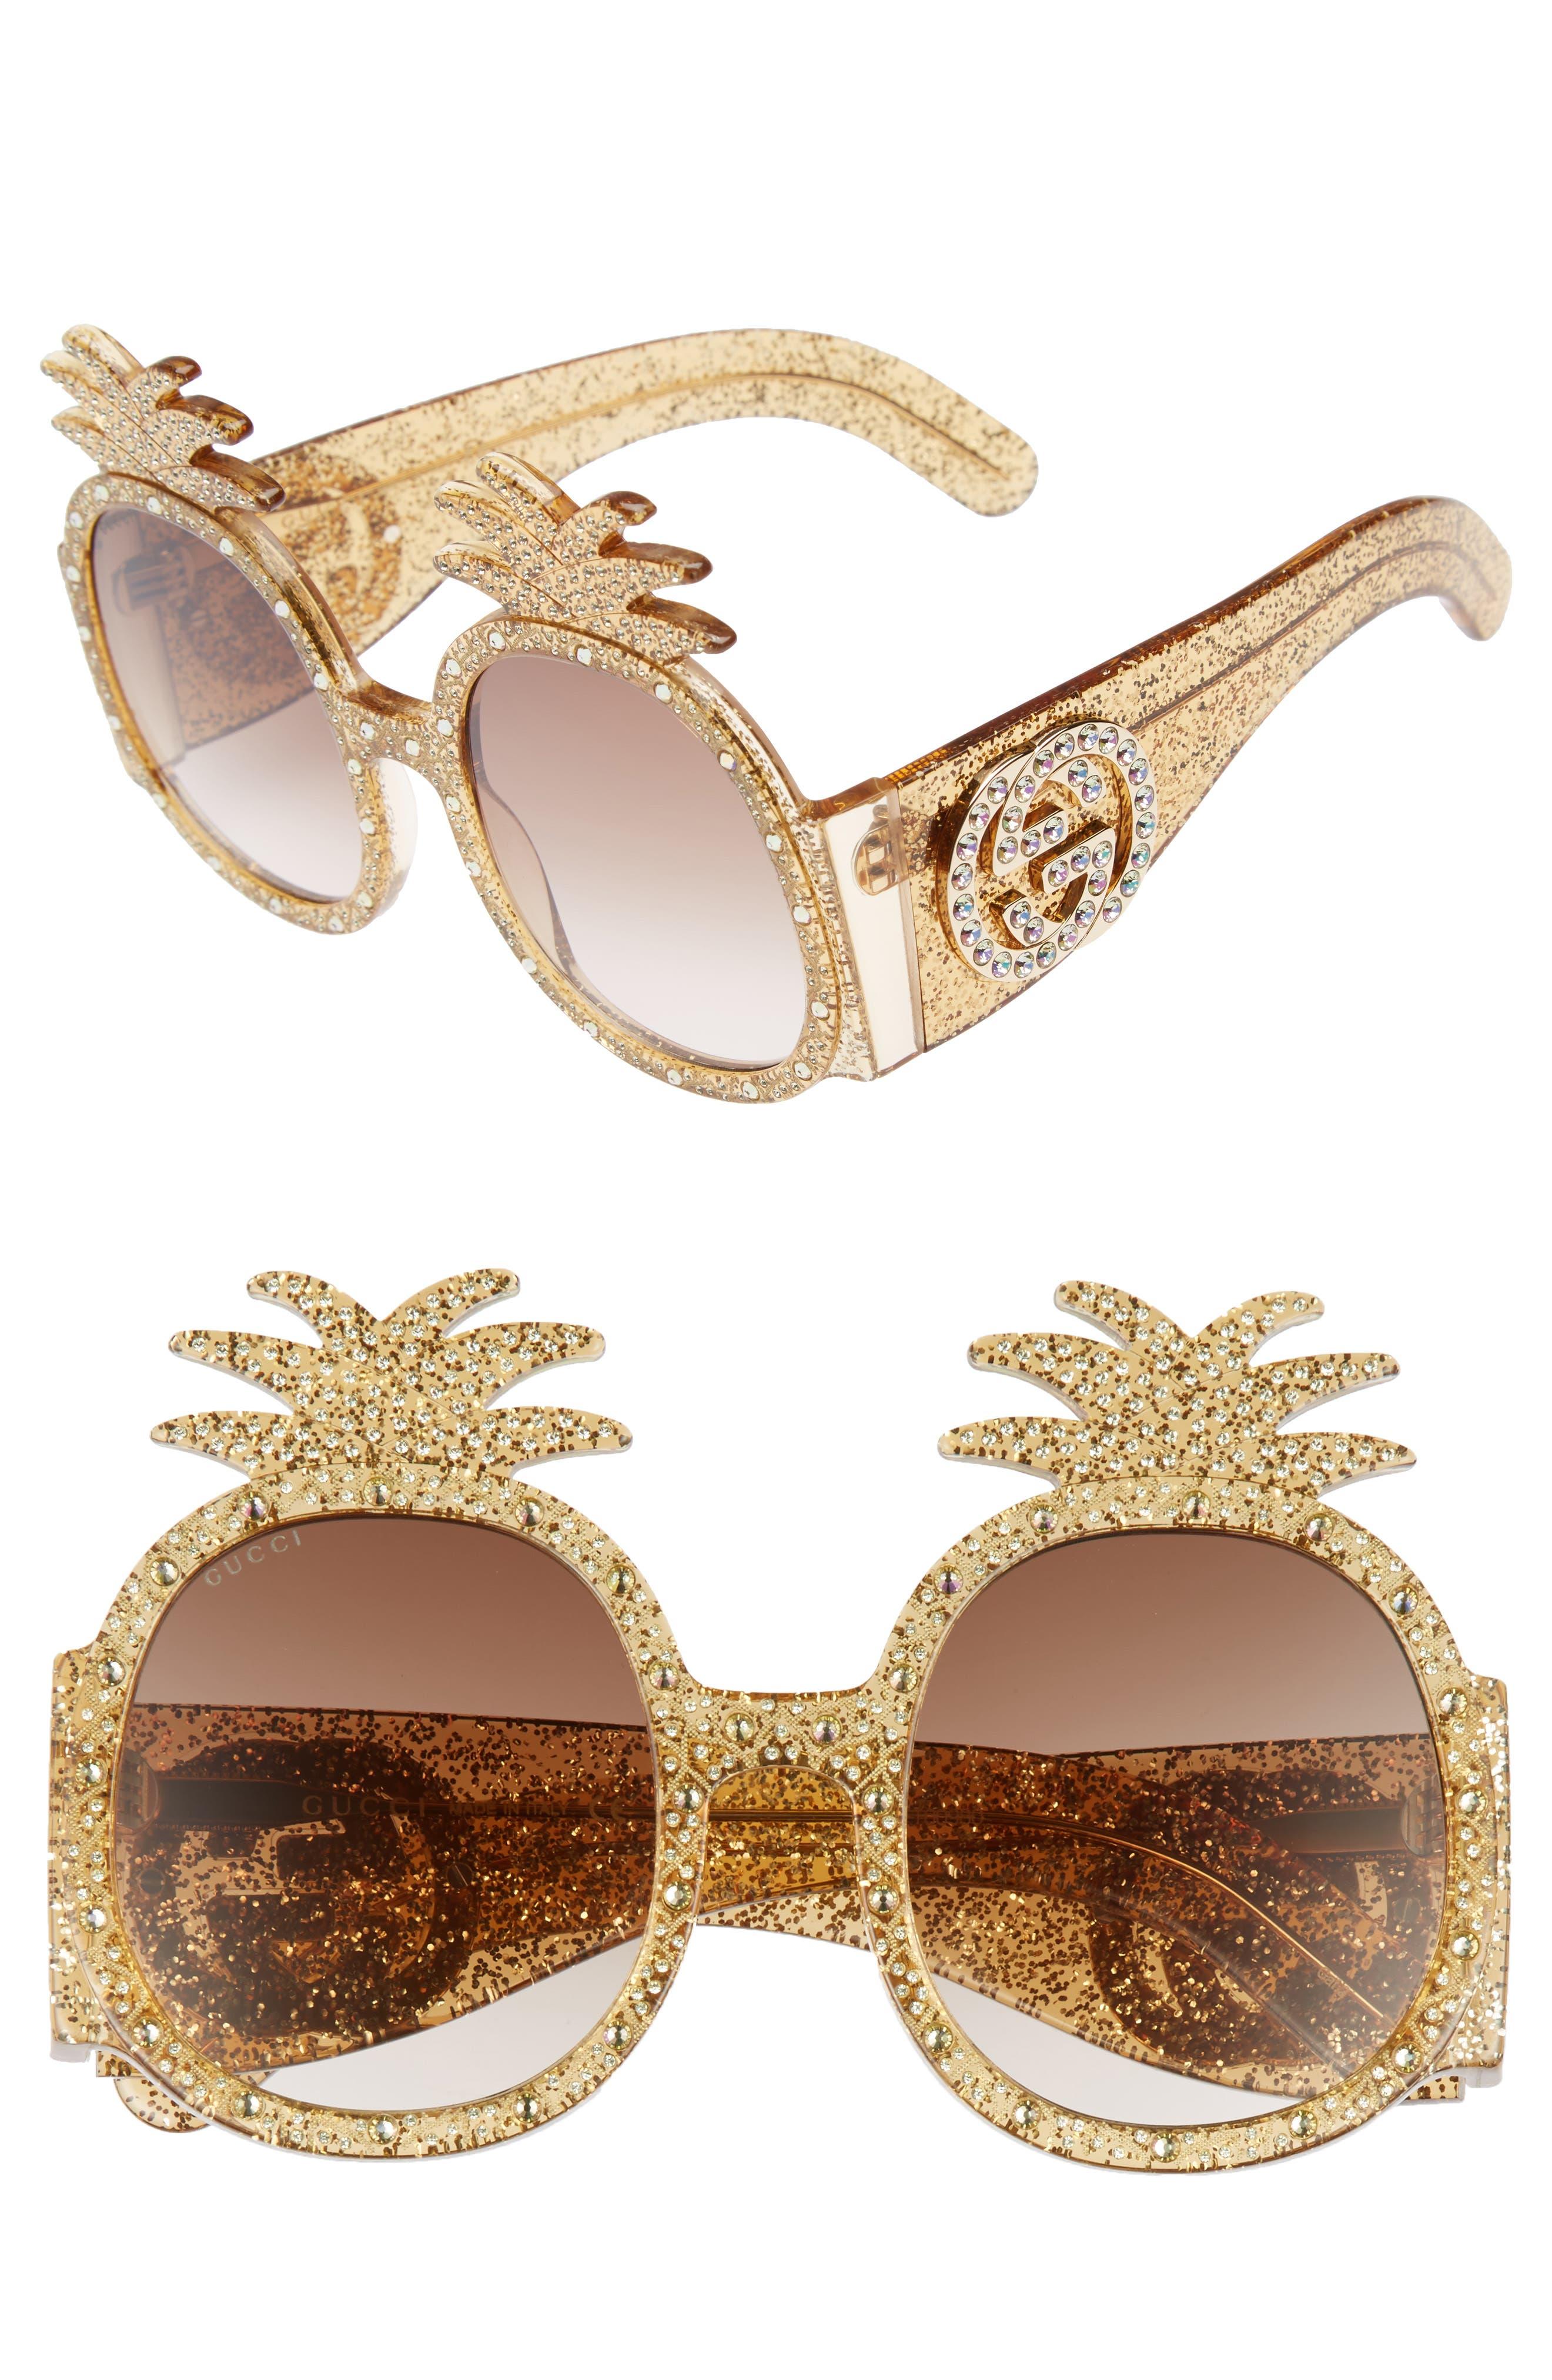 gucci sunglasses. main image - gucci 53mm pineapple sunglasses